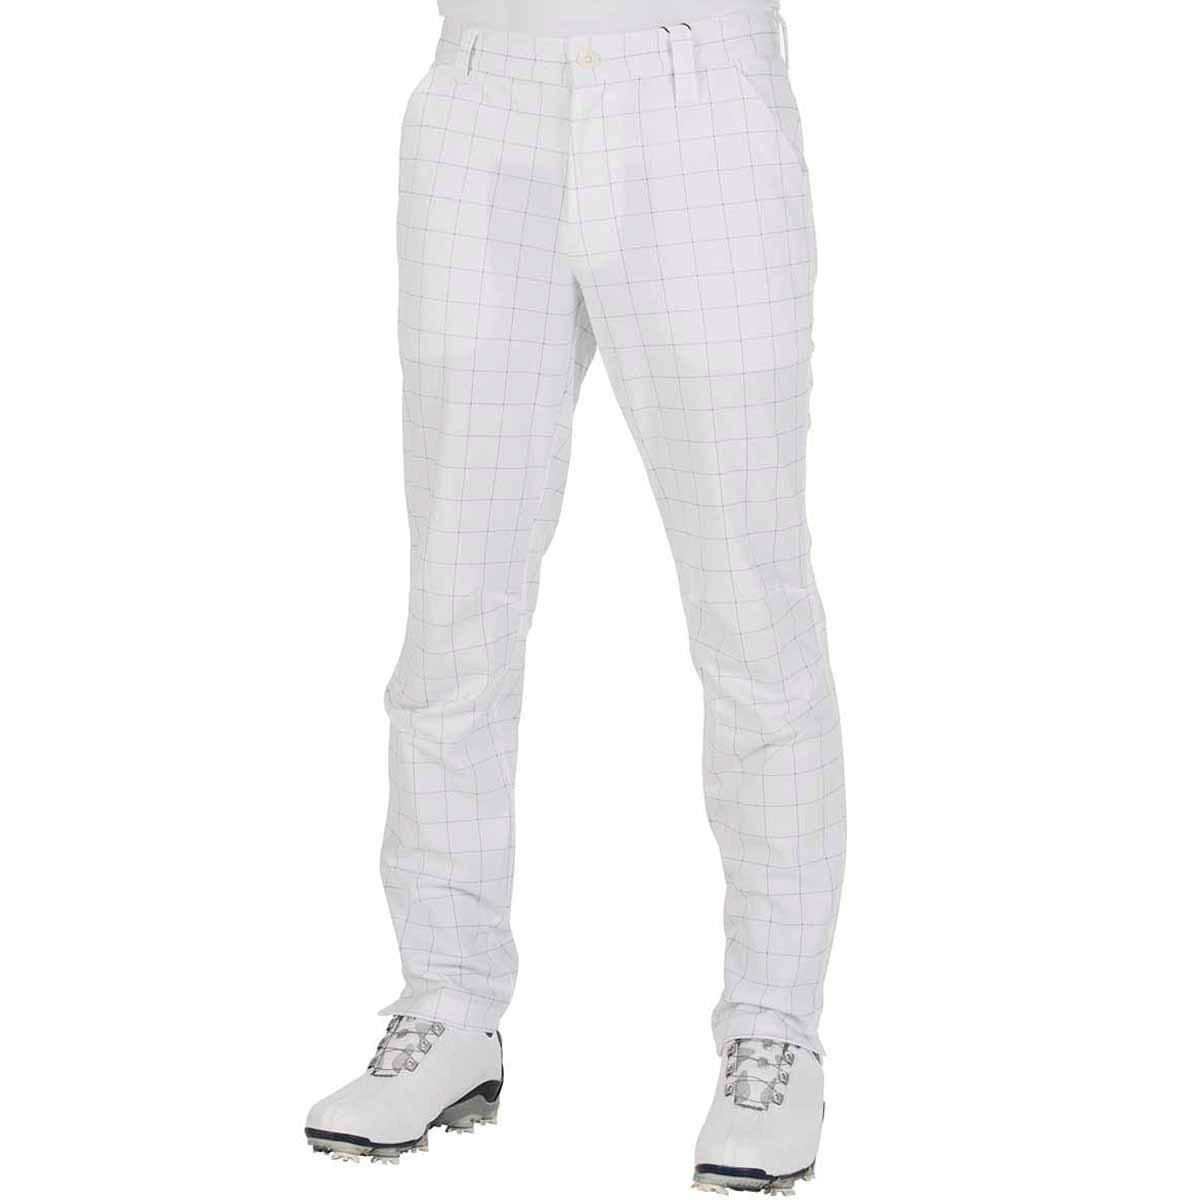 GDO オリジナル GDO ORIGINAL 6ポケットジャージゴルフパンツ 股下73cm 1:ウエスト目安75-77 ホワイトペン